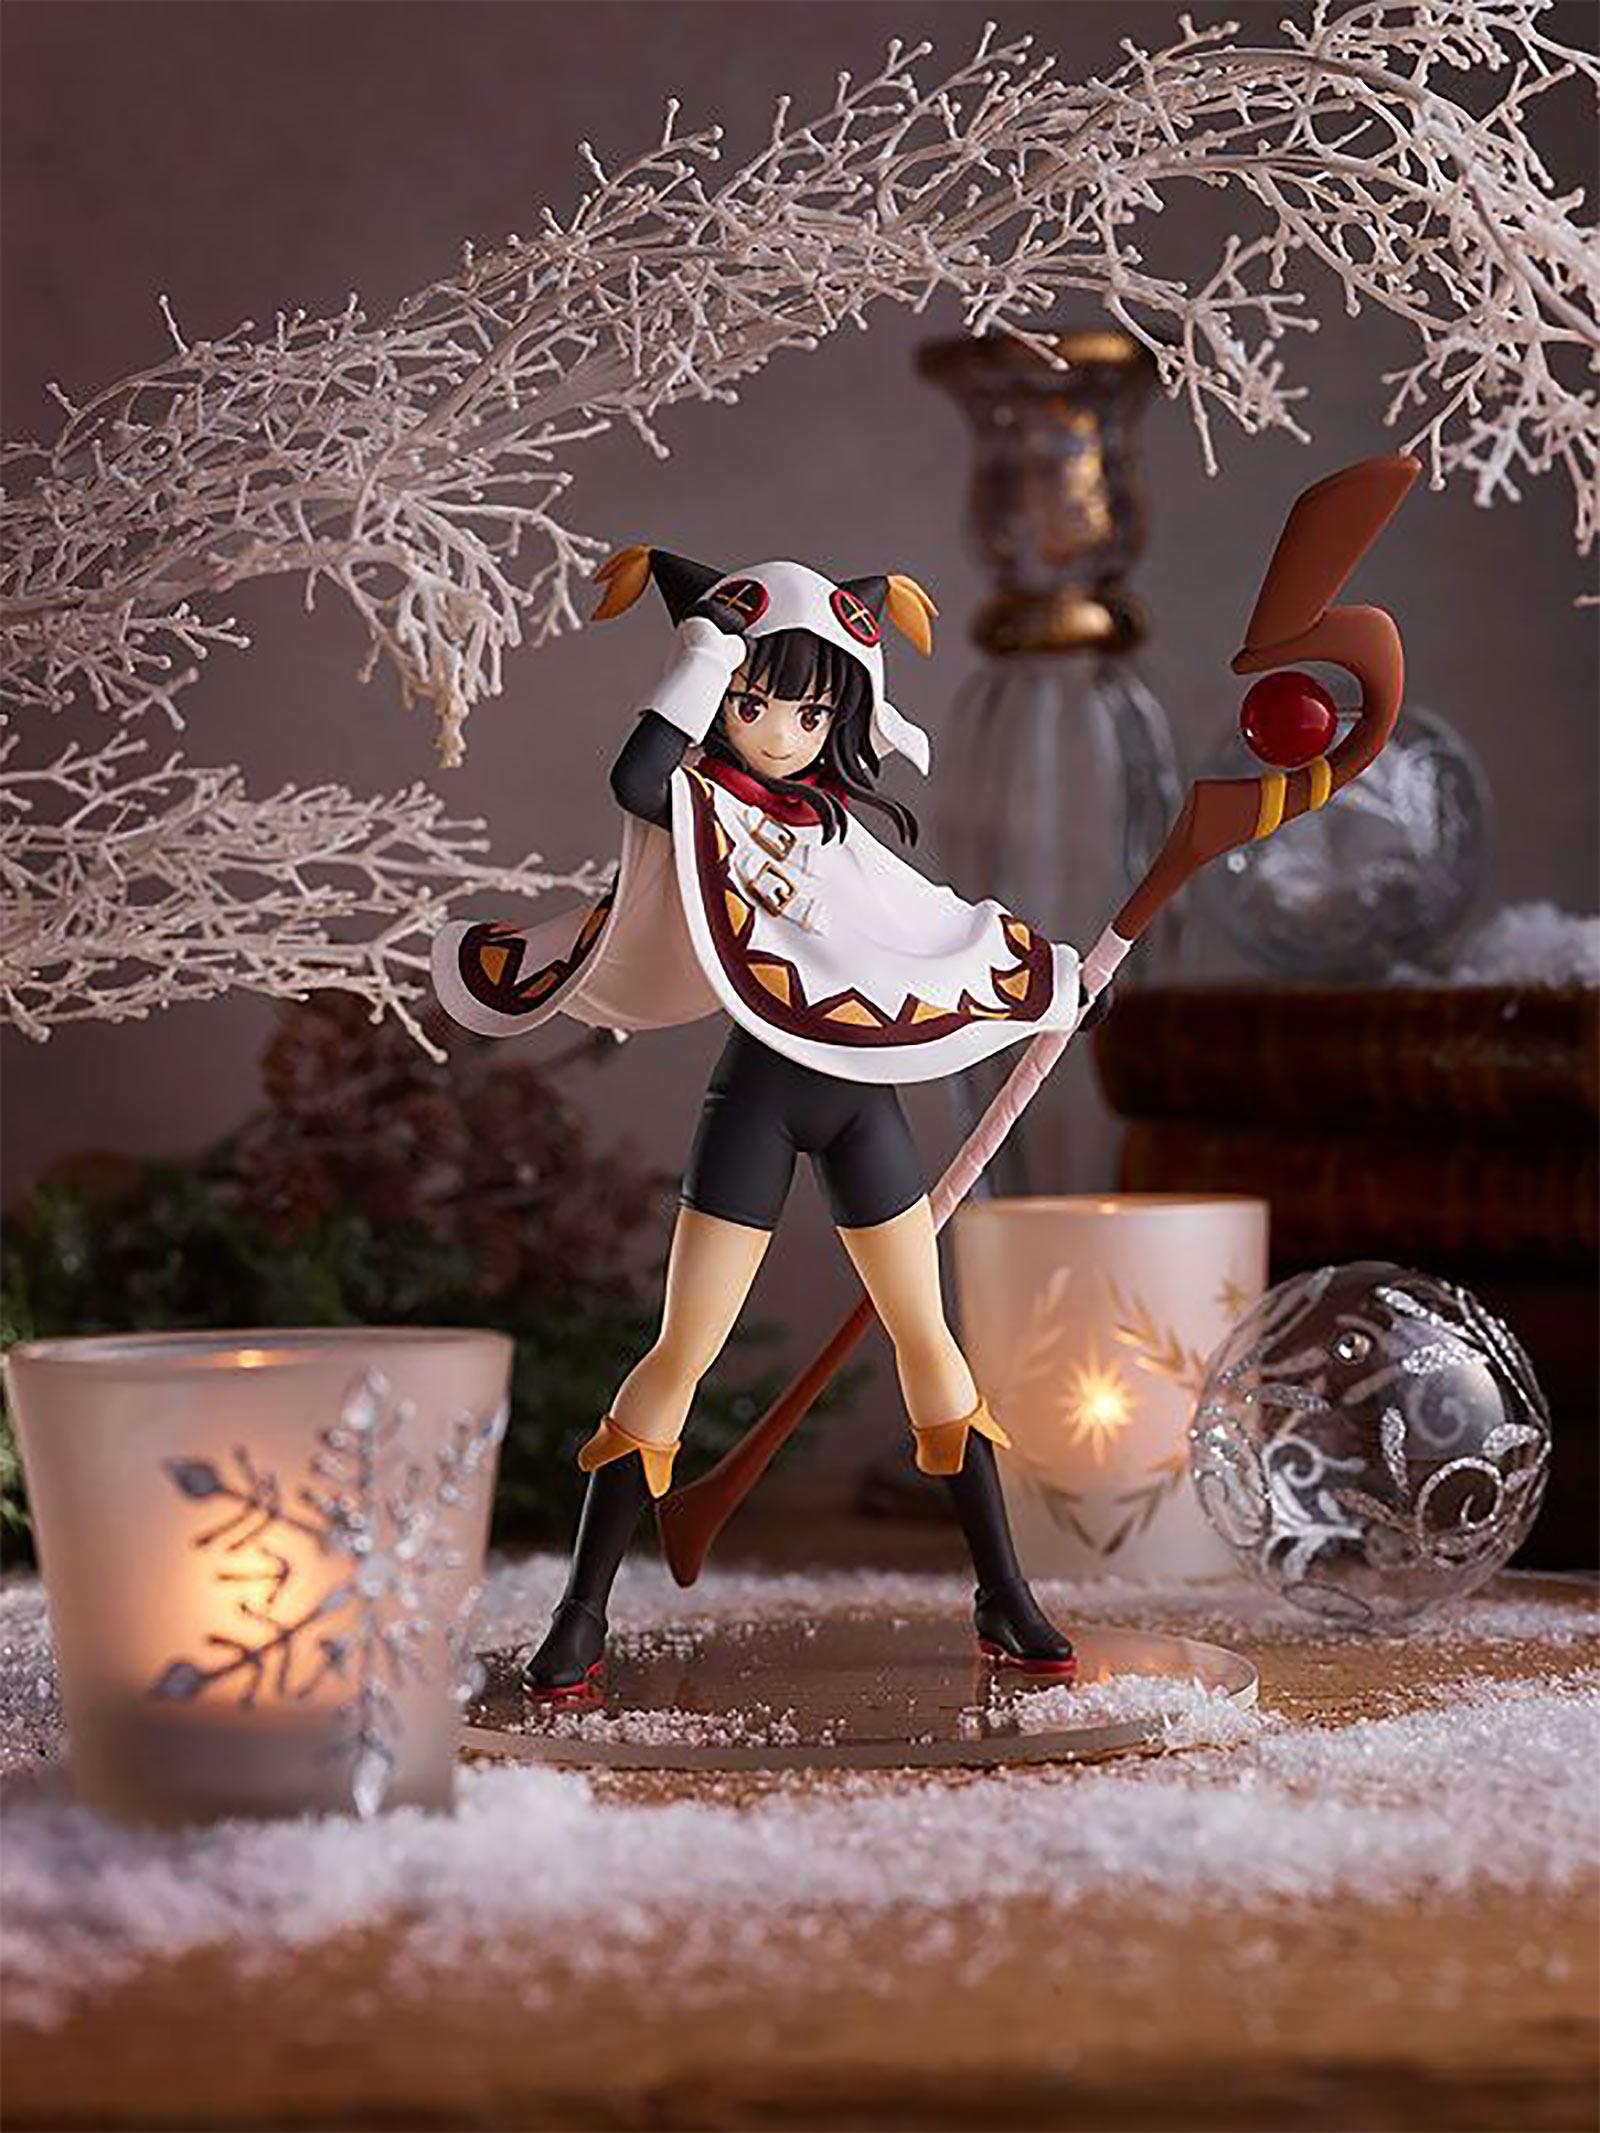 KonoSuba - Megumin Winter Ver. Legend of Crimson Figur